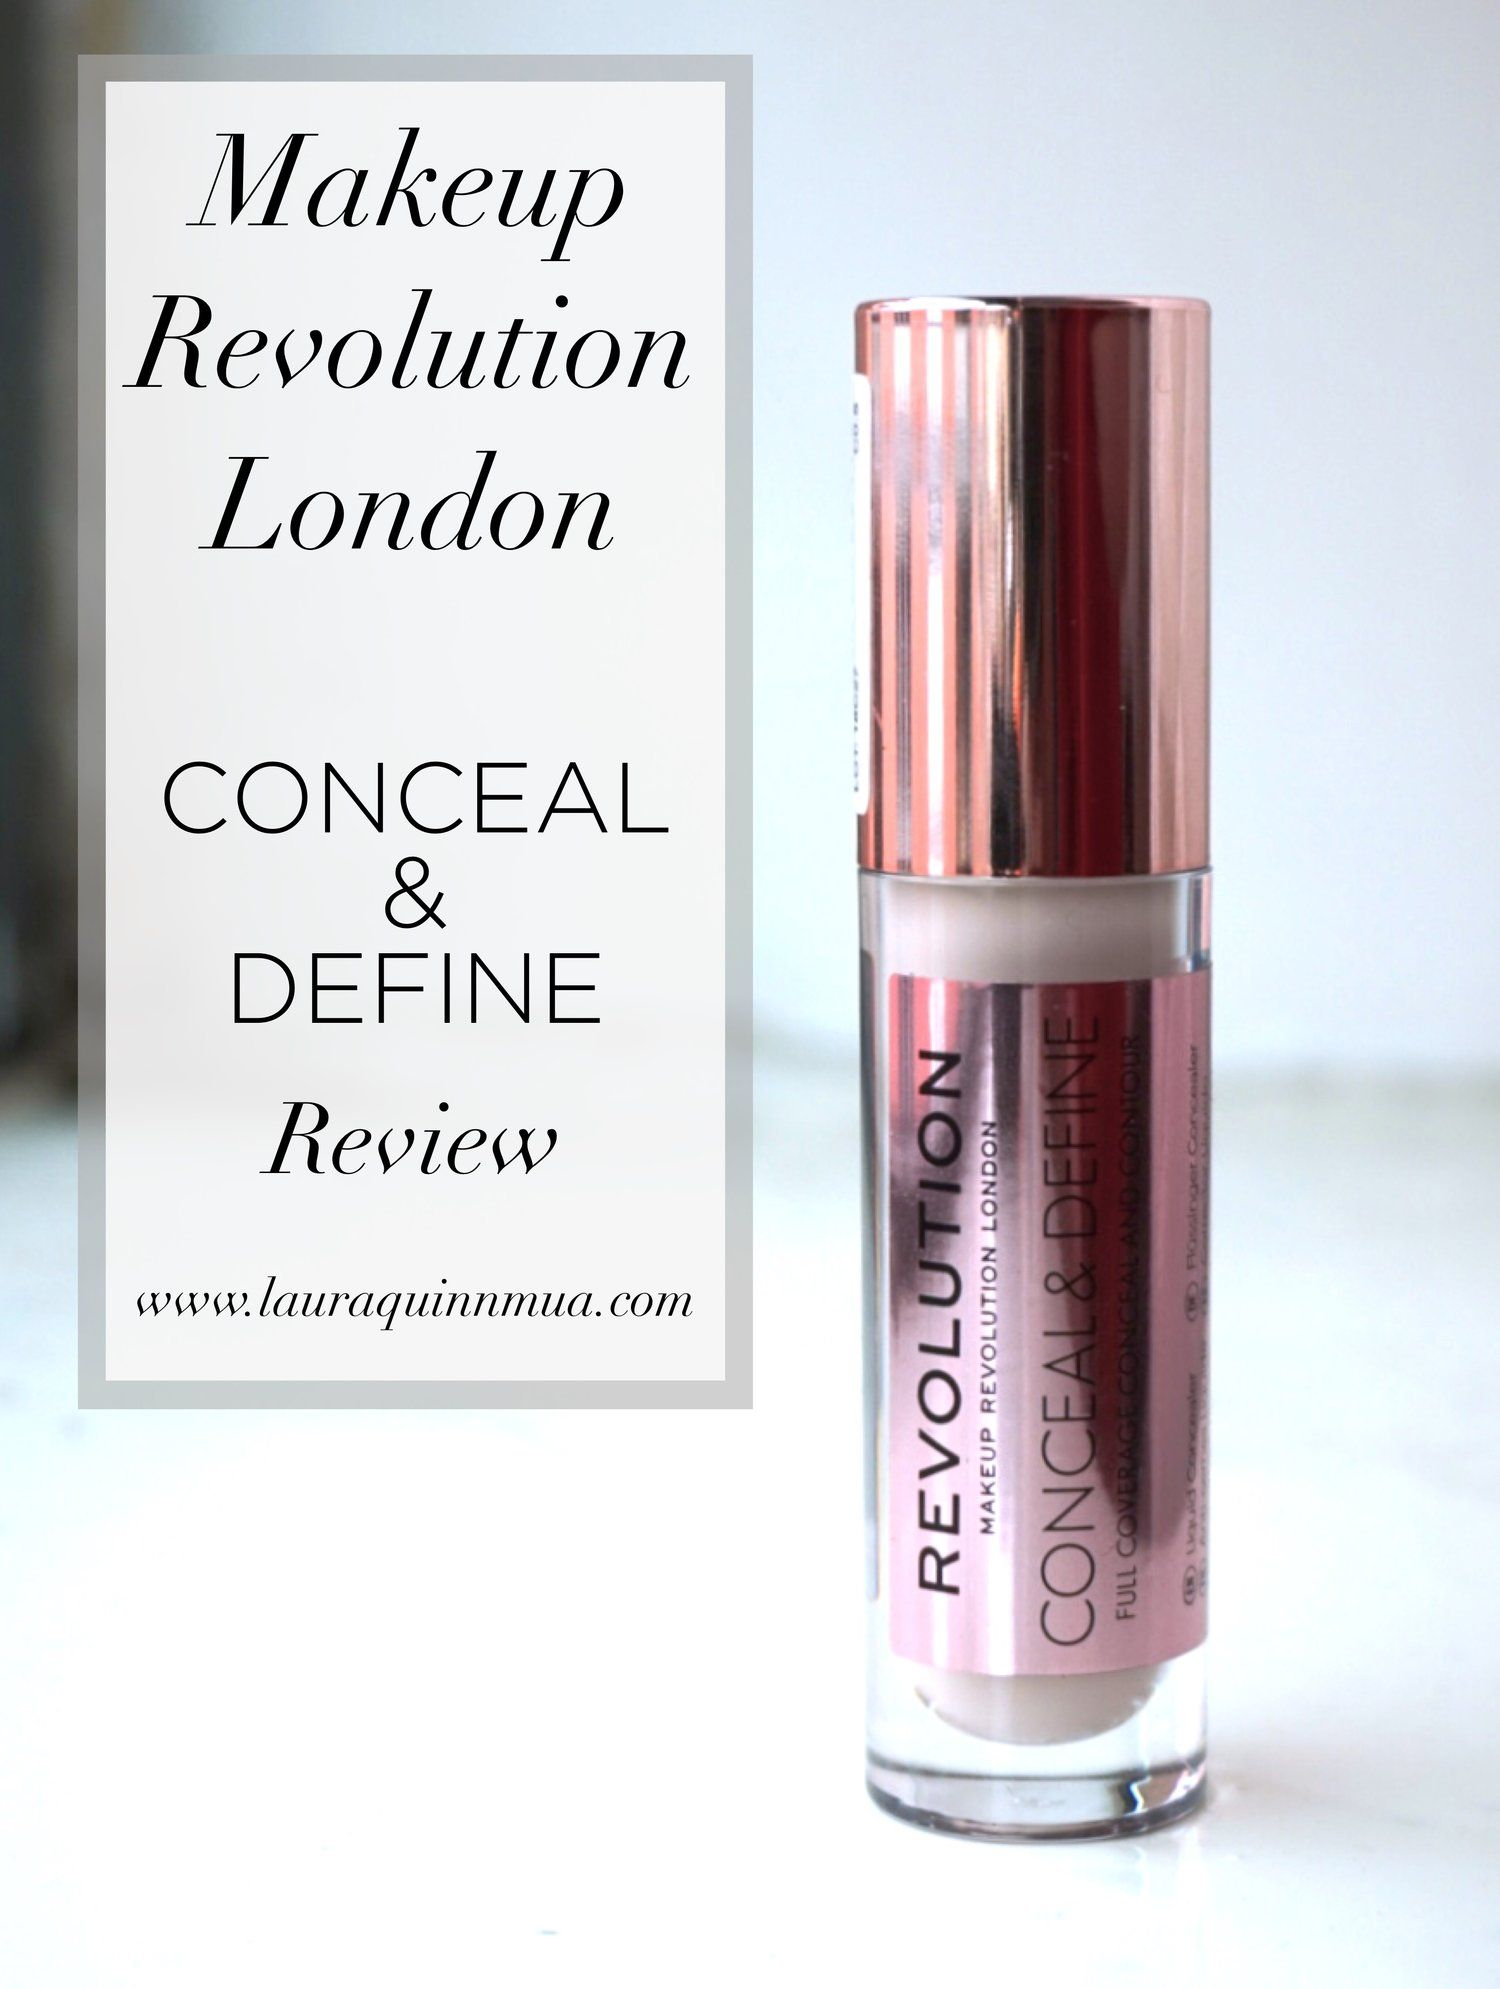 Makeup Revolution London Conceal & Define Review Makeup